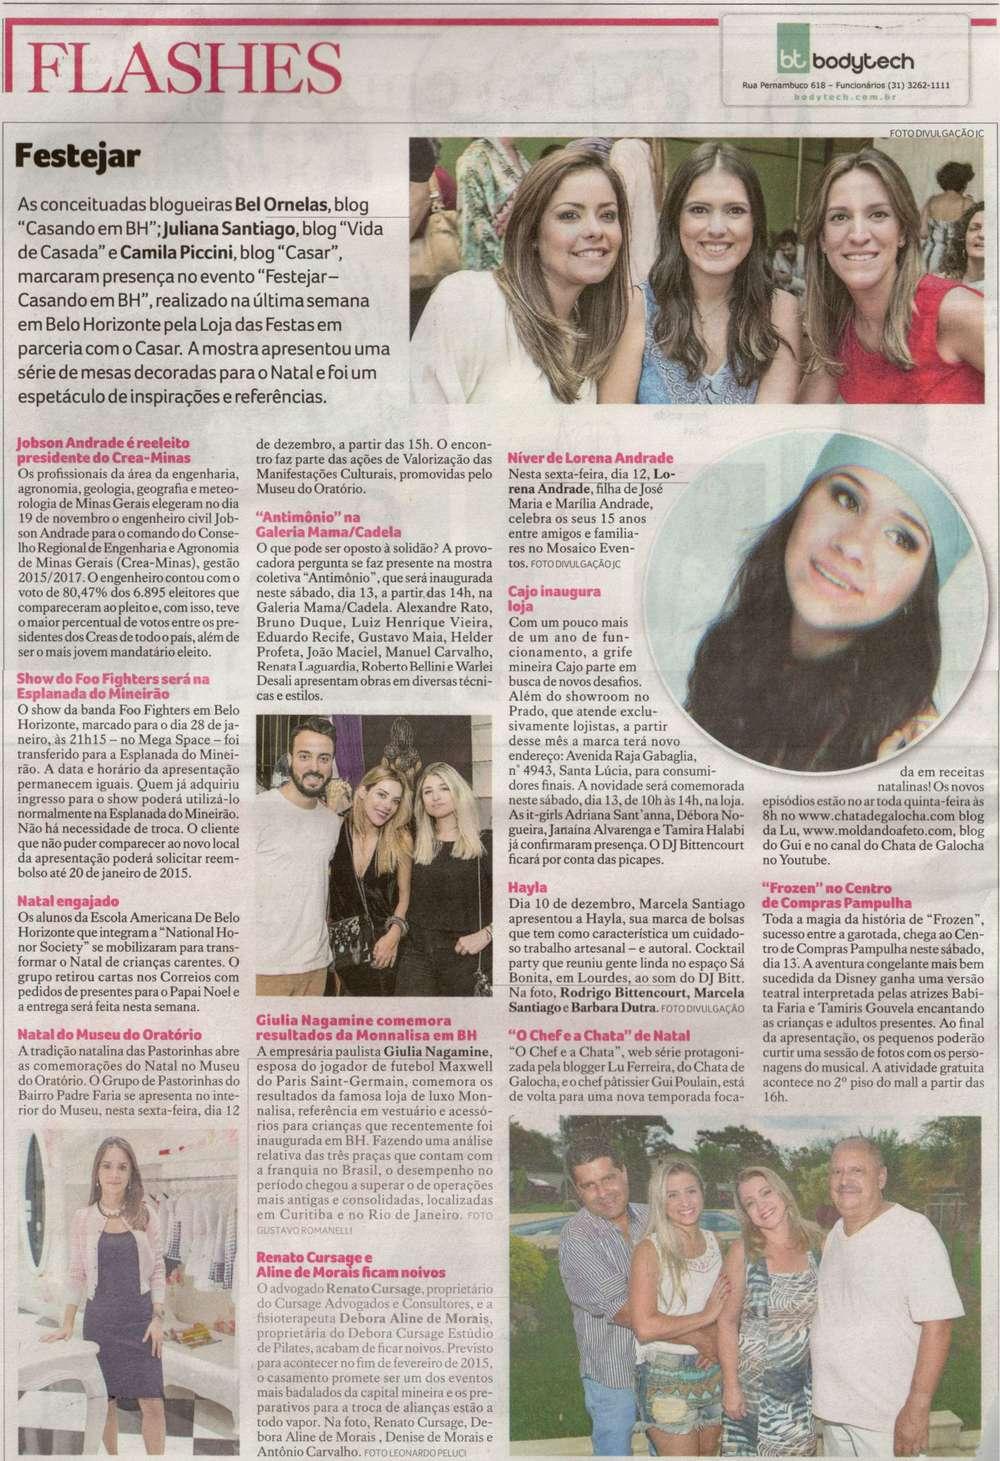 Cajo - Jornal da Cidade - 12a18-12-2014 (1) (2).jpg